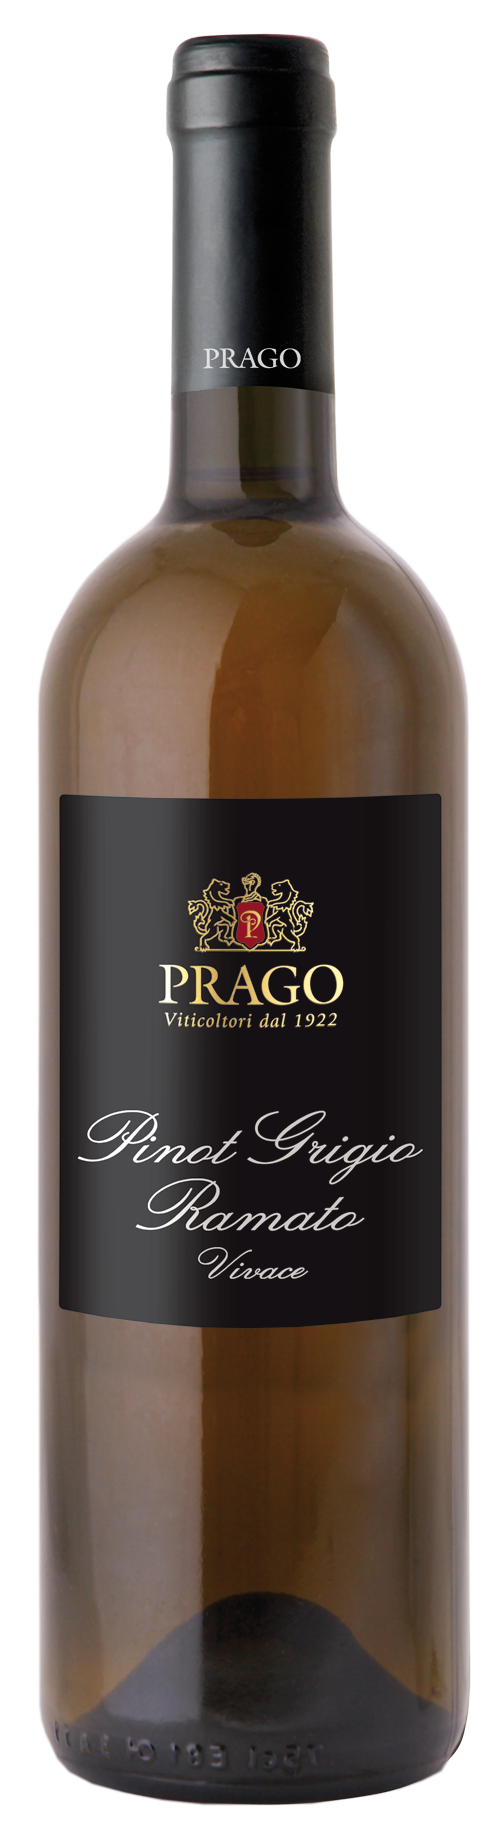 PRAGO Vini e Spumanti Oltrepò Pavese - Vini Vivaci - Pinot Grigio Ramato